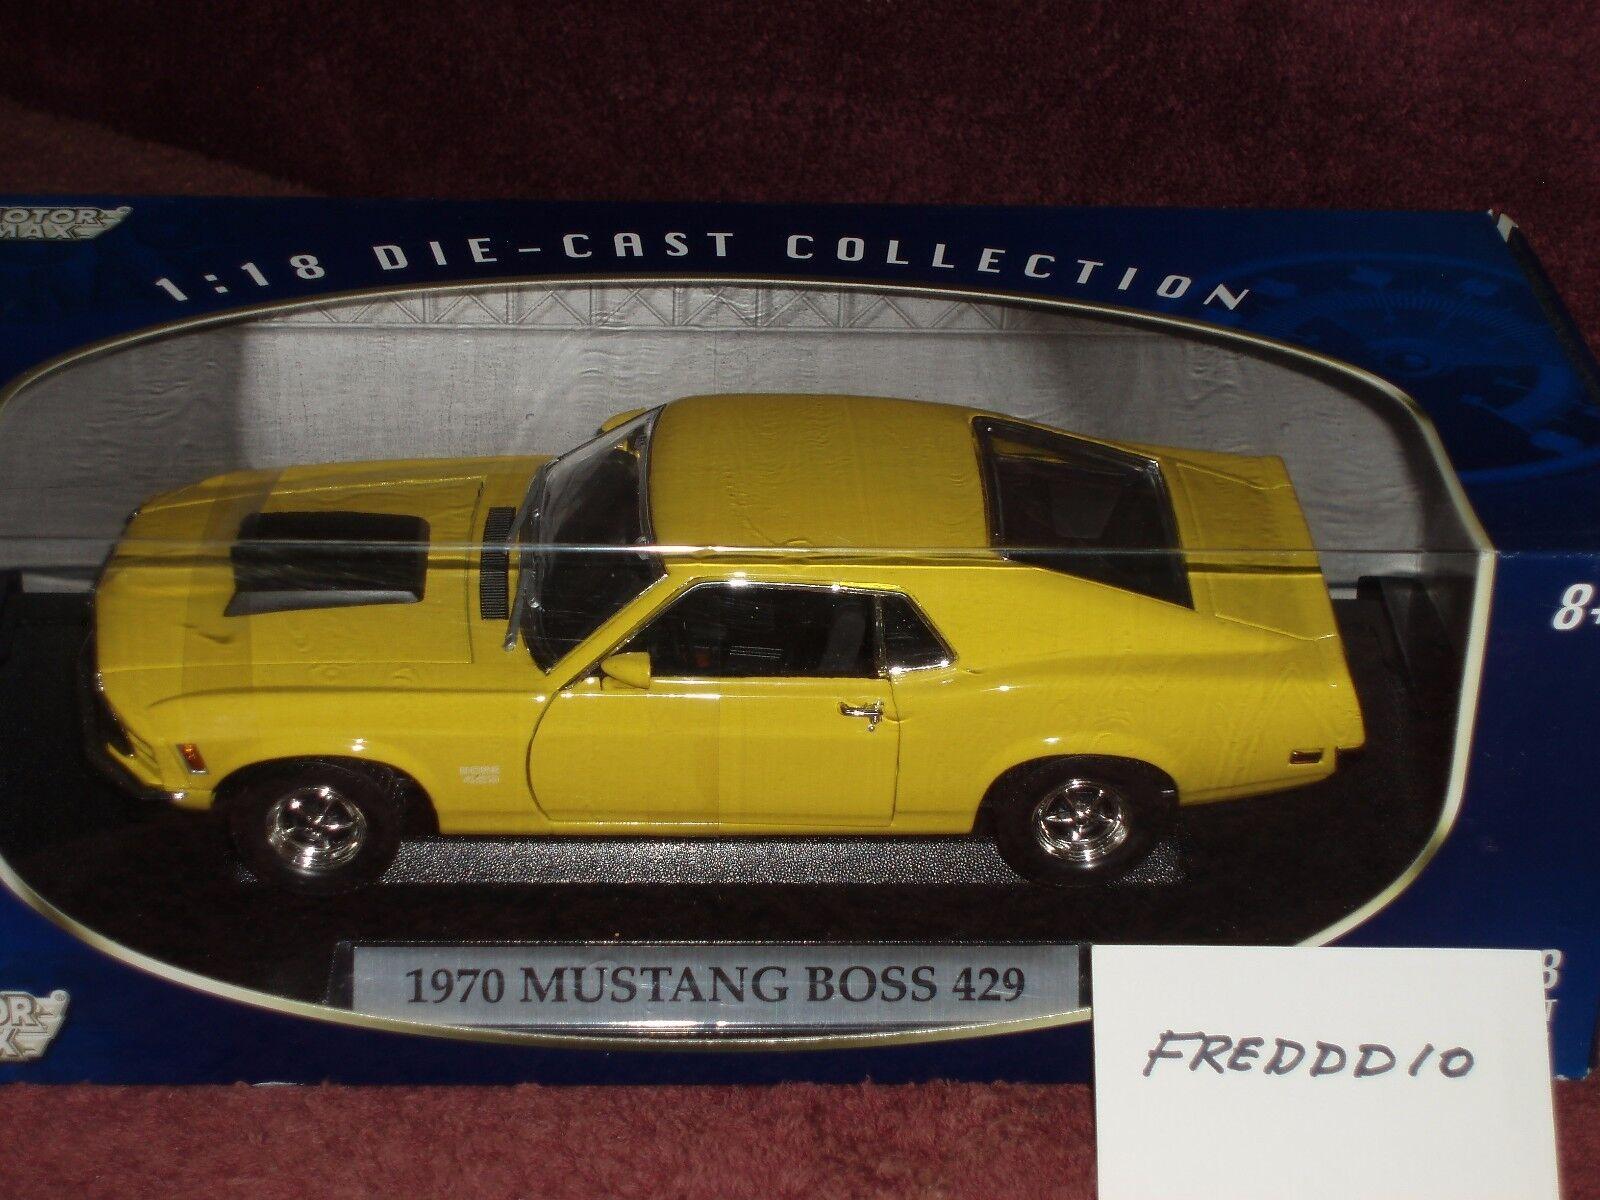 Motor Max 1970 Ford Mustang Boss 429 giallo nero Interior & Trim 1 18 Menta en caja